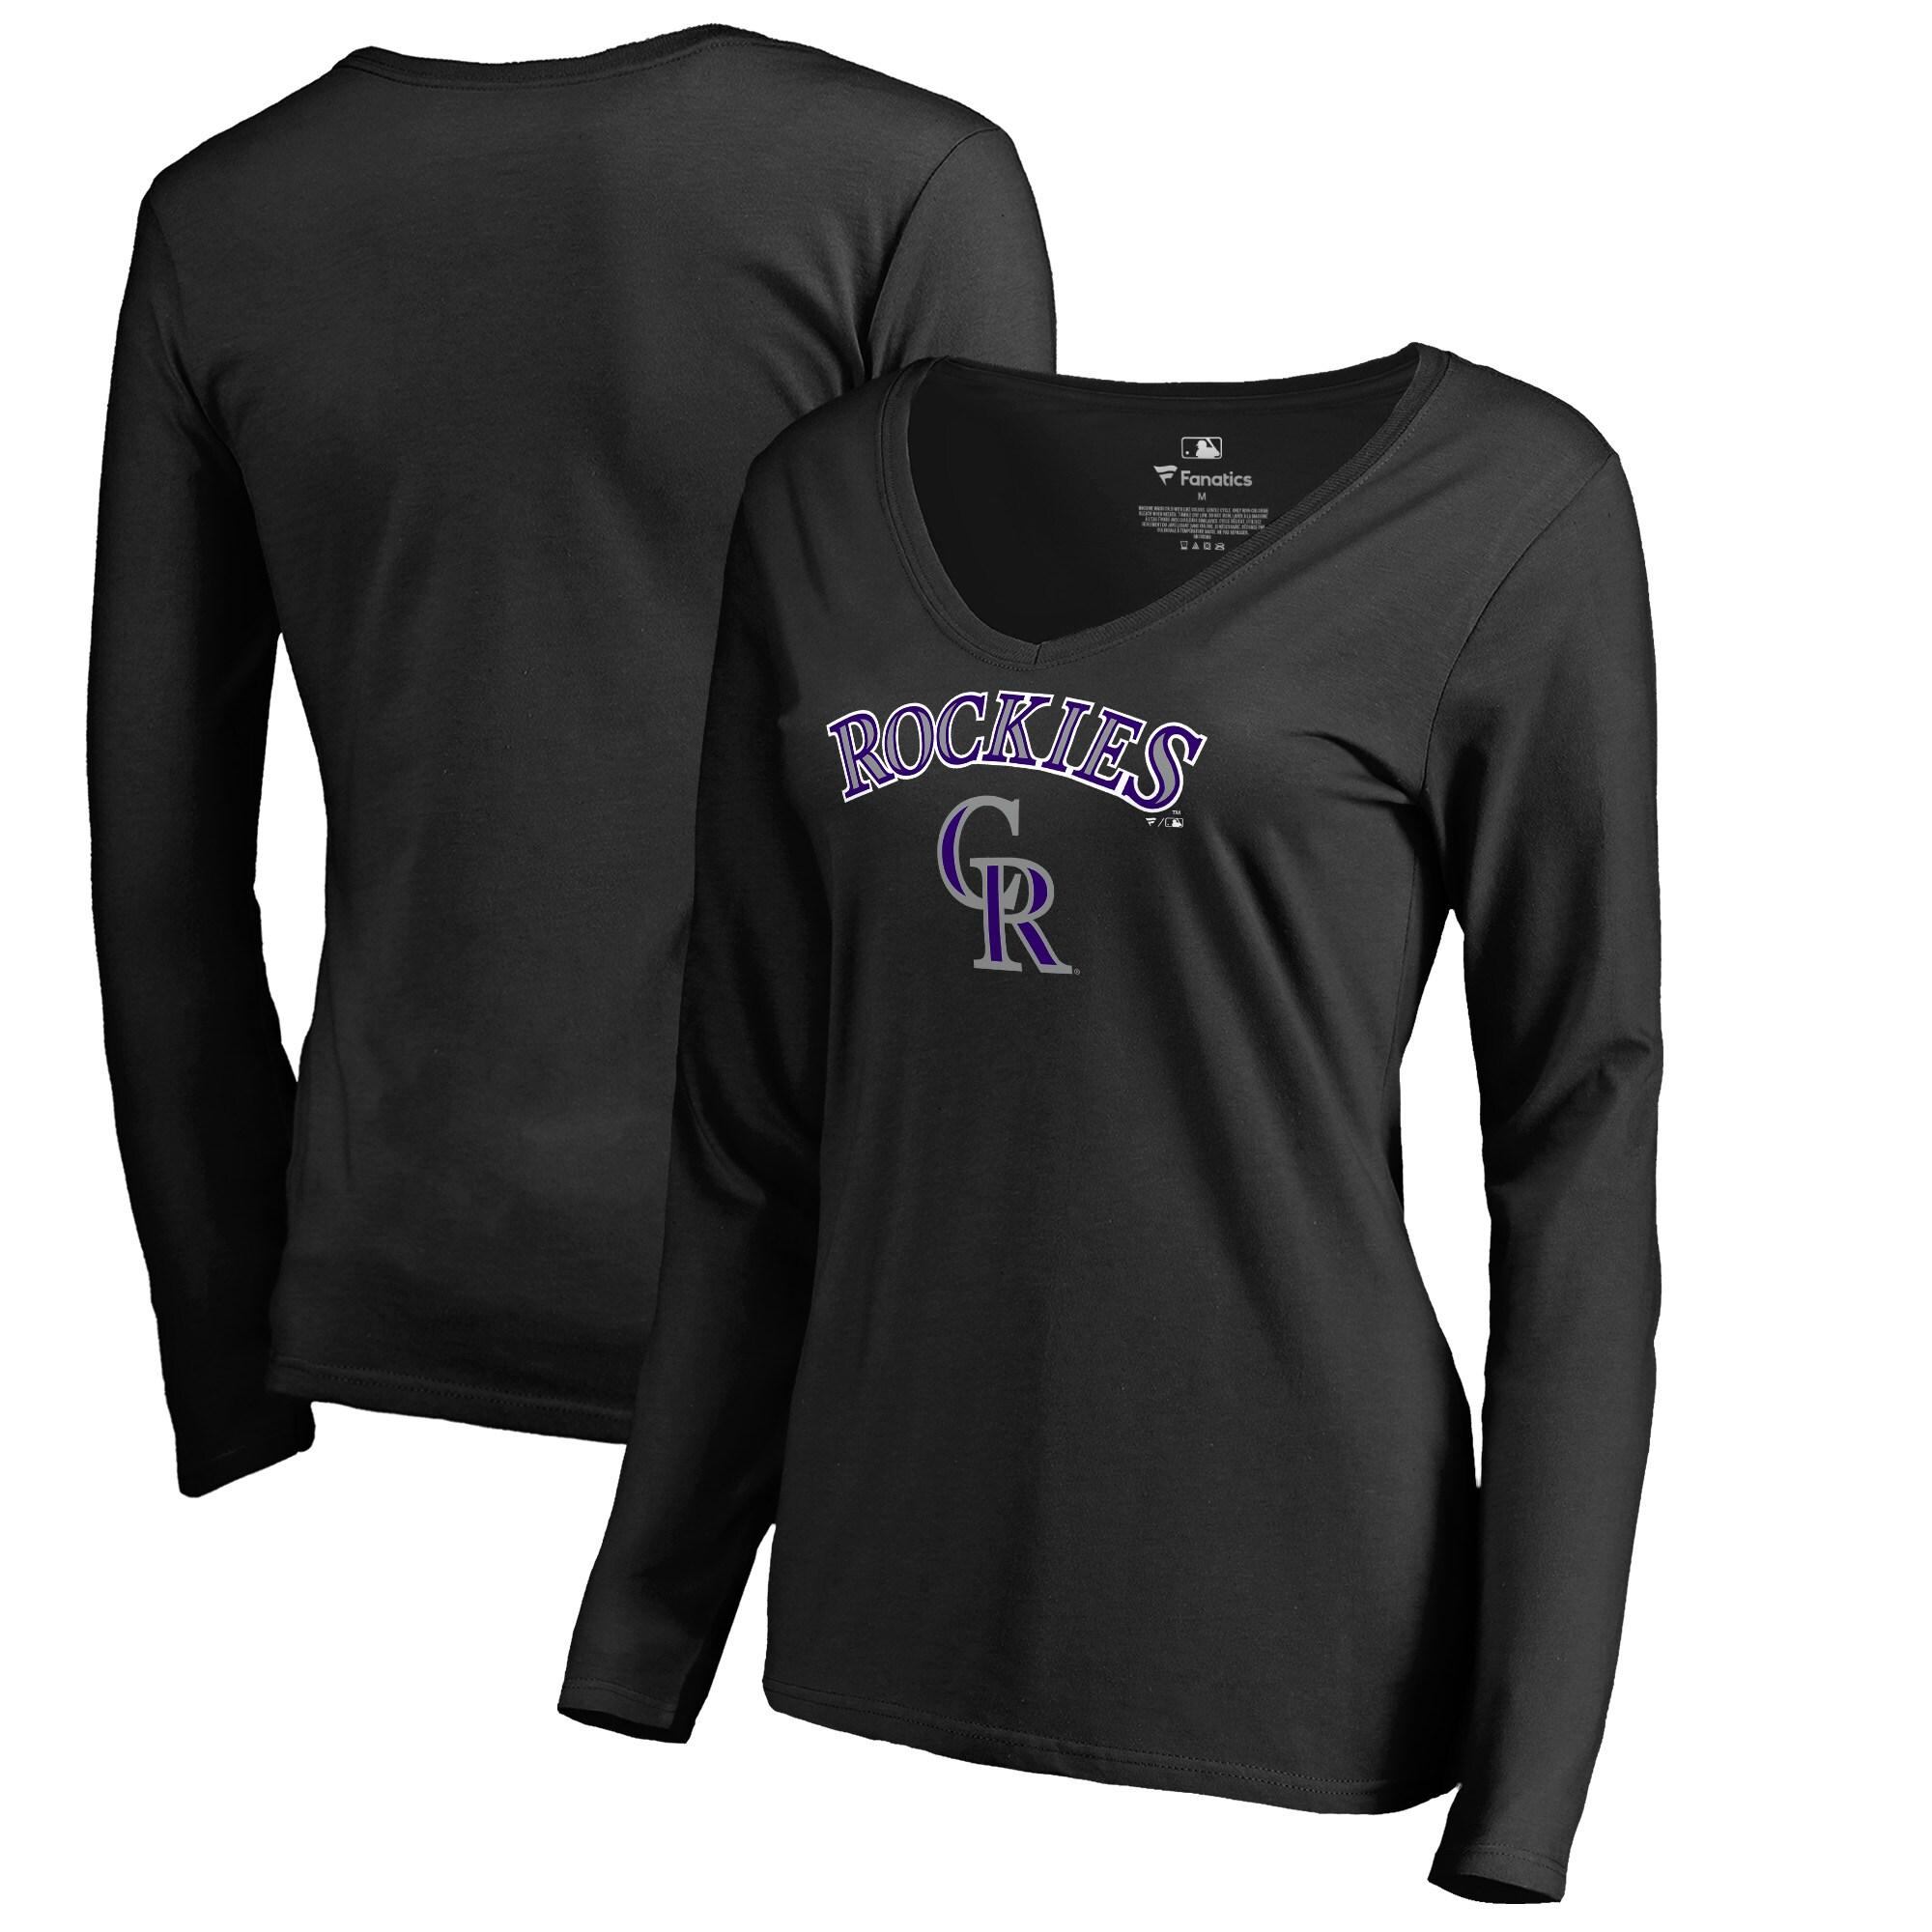 Colorado Rockies Fanatics Branded Women's Team Lockup Slim Fit Long Sleeve V-Neck T-Shirt - Black